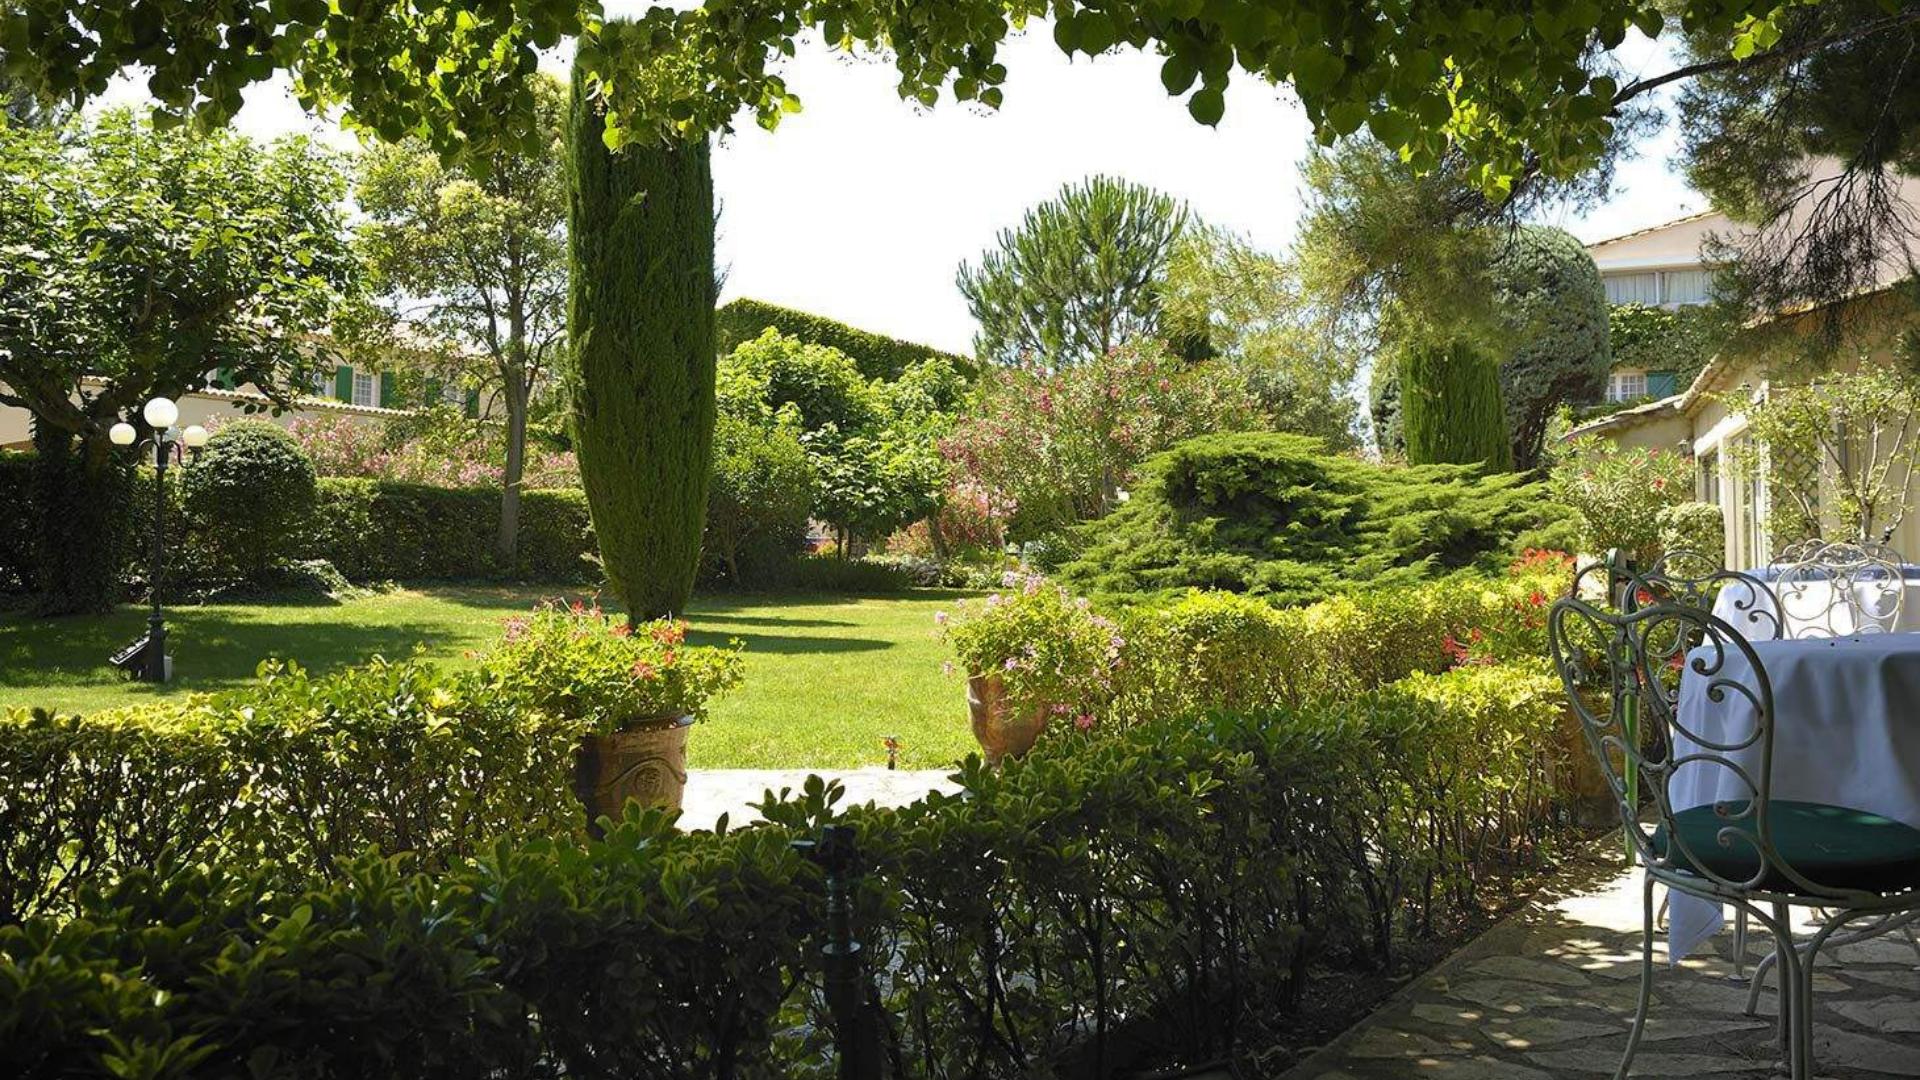 Hôtel · Auberge de Cassagne · Hotel de luxe 5 étoiles Avignon, Provence - Jardin